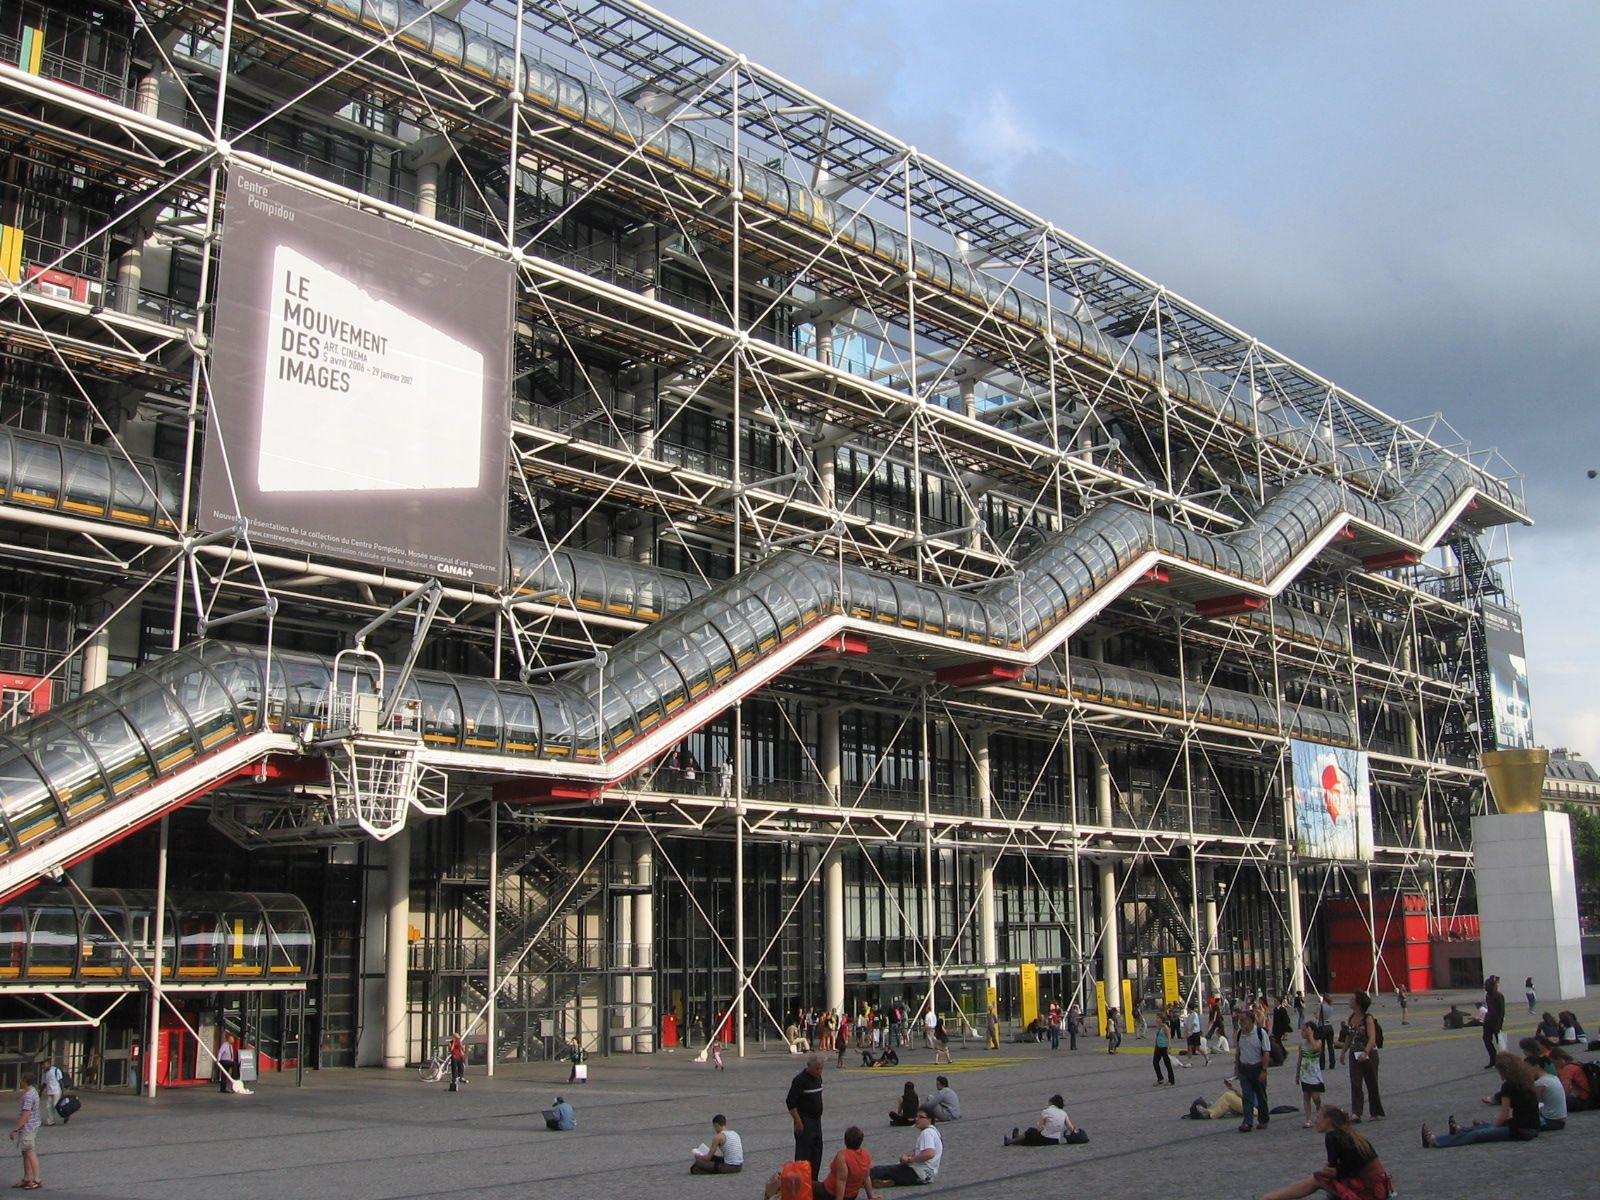 Renzo piano richard rogers centre georges pompidou - Centre george pompidou architecture ...